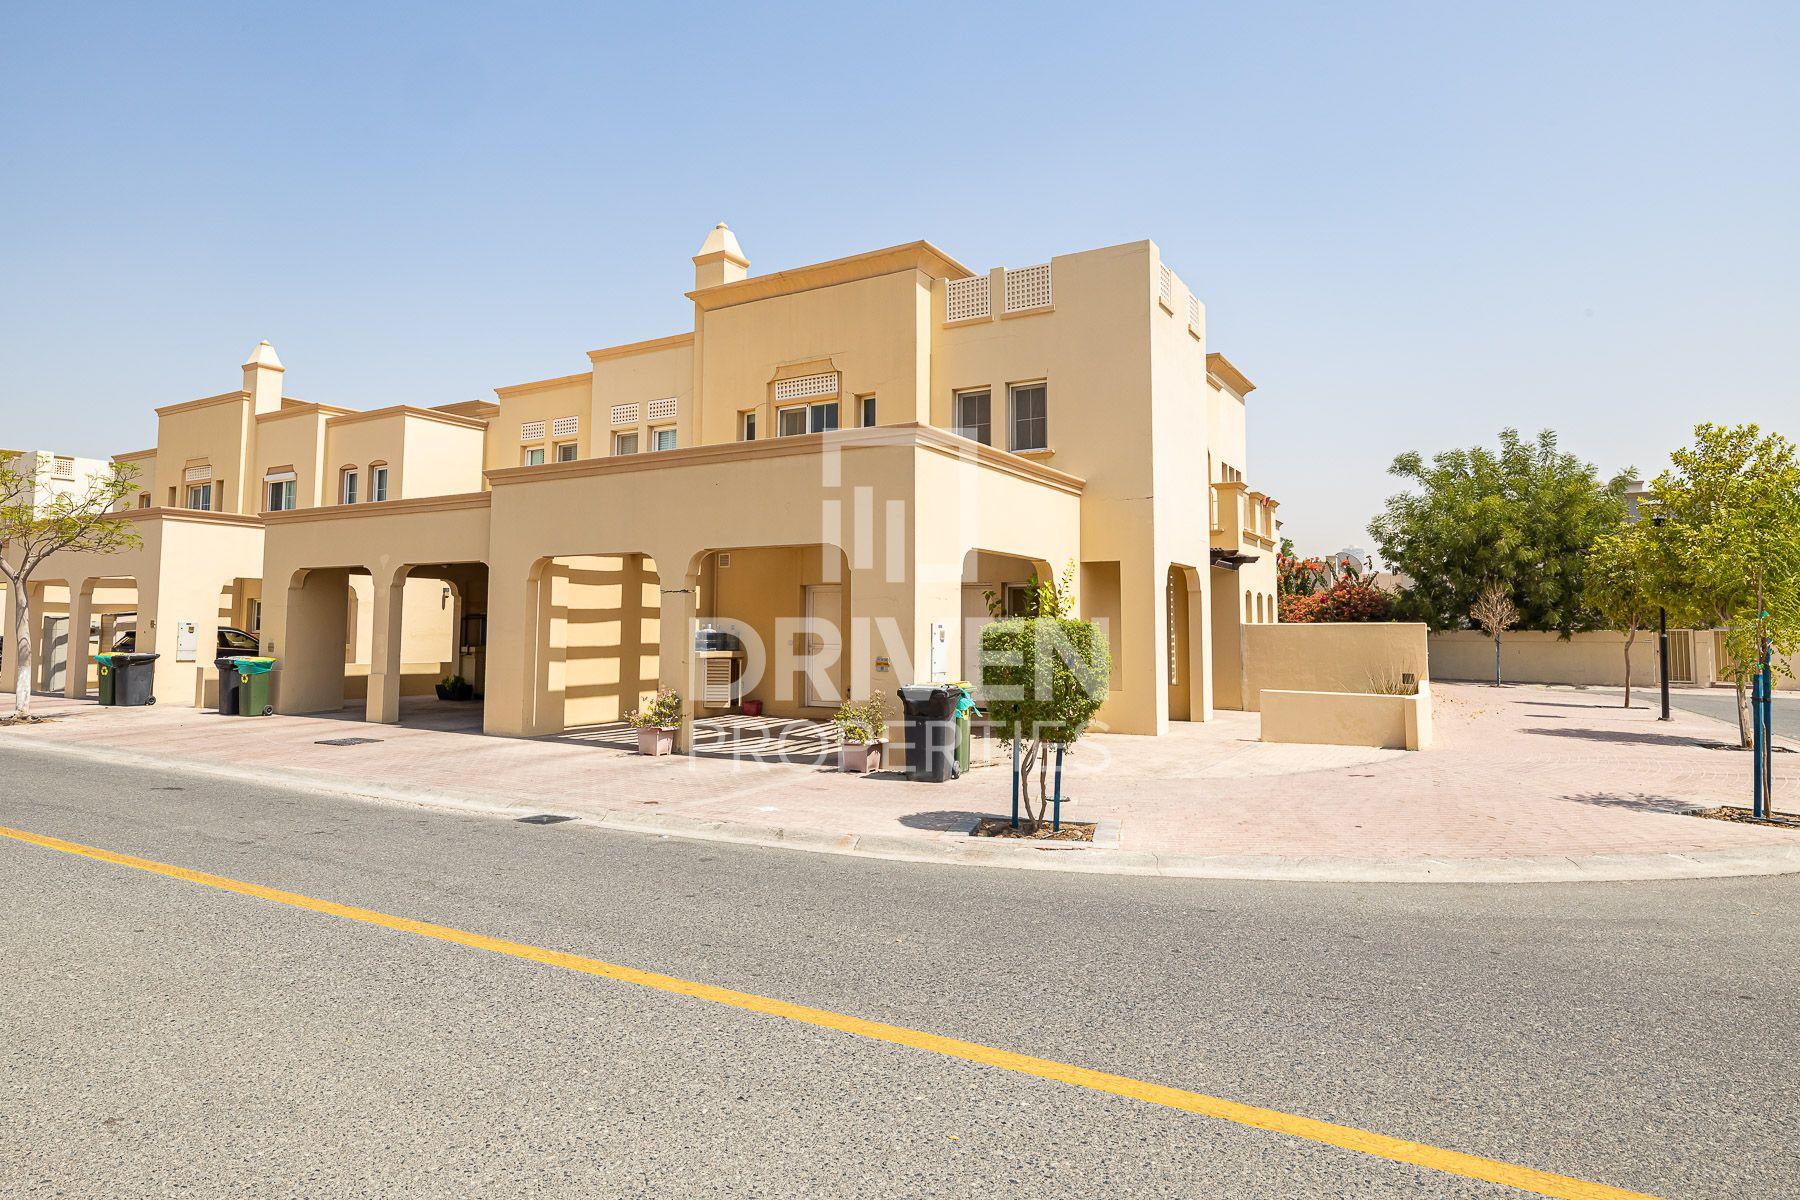 Villa for Sale in Springs 14 - The Springs